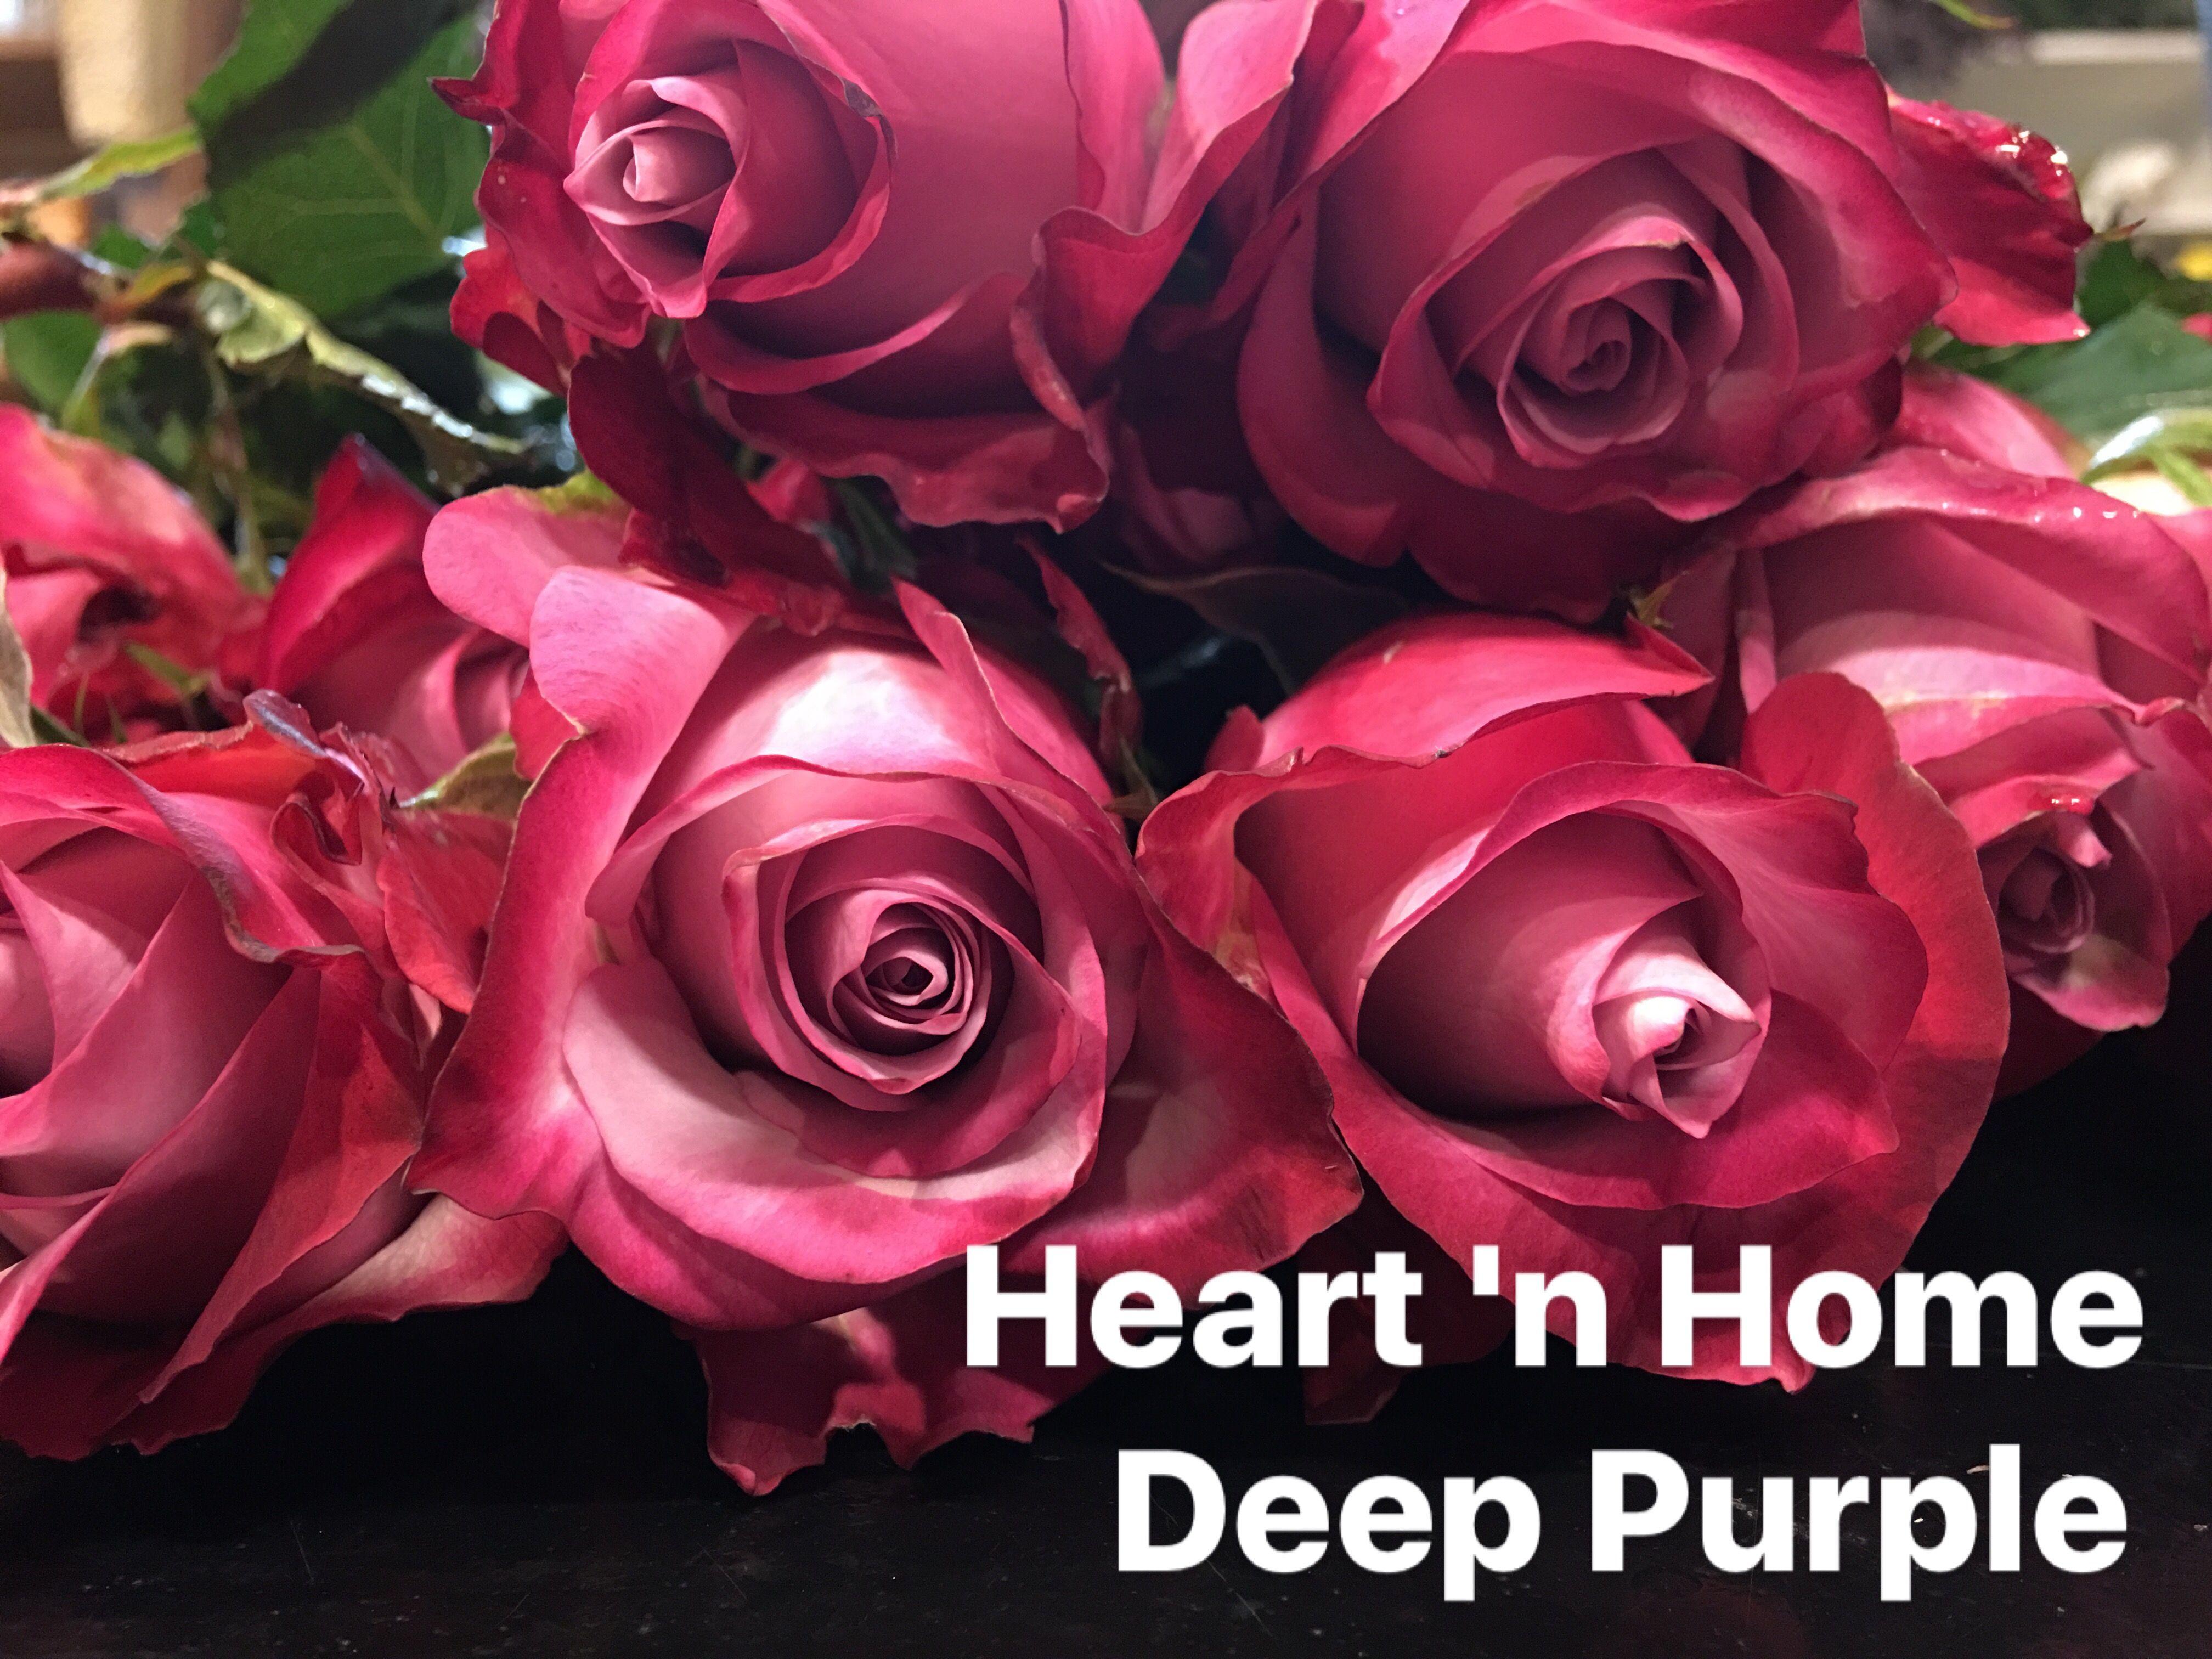 Deep purple roses 50 cm purple roses rose florist